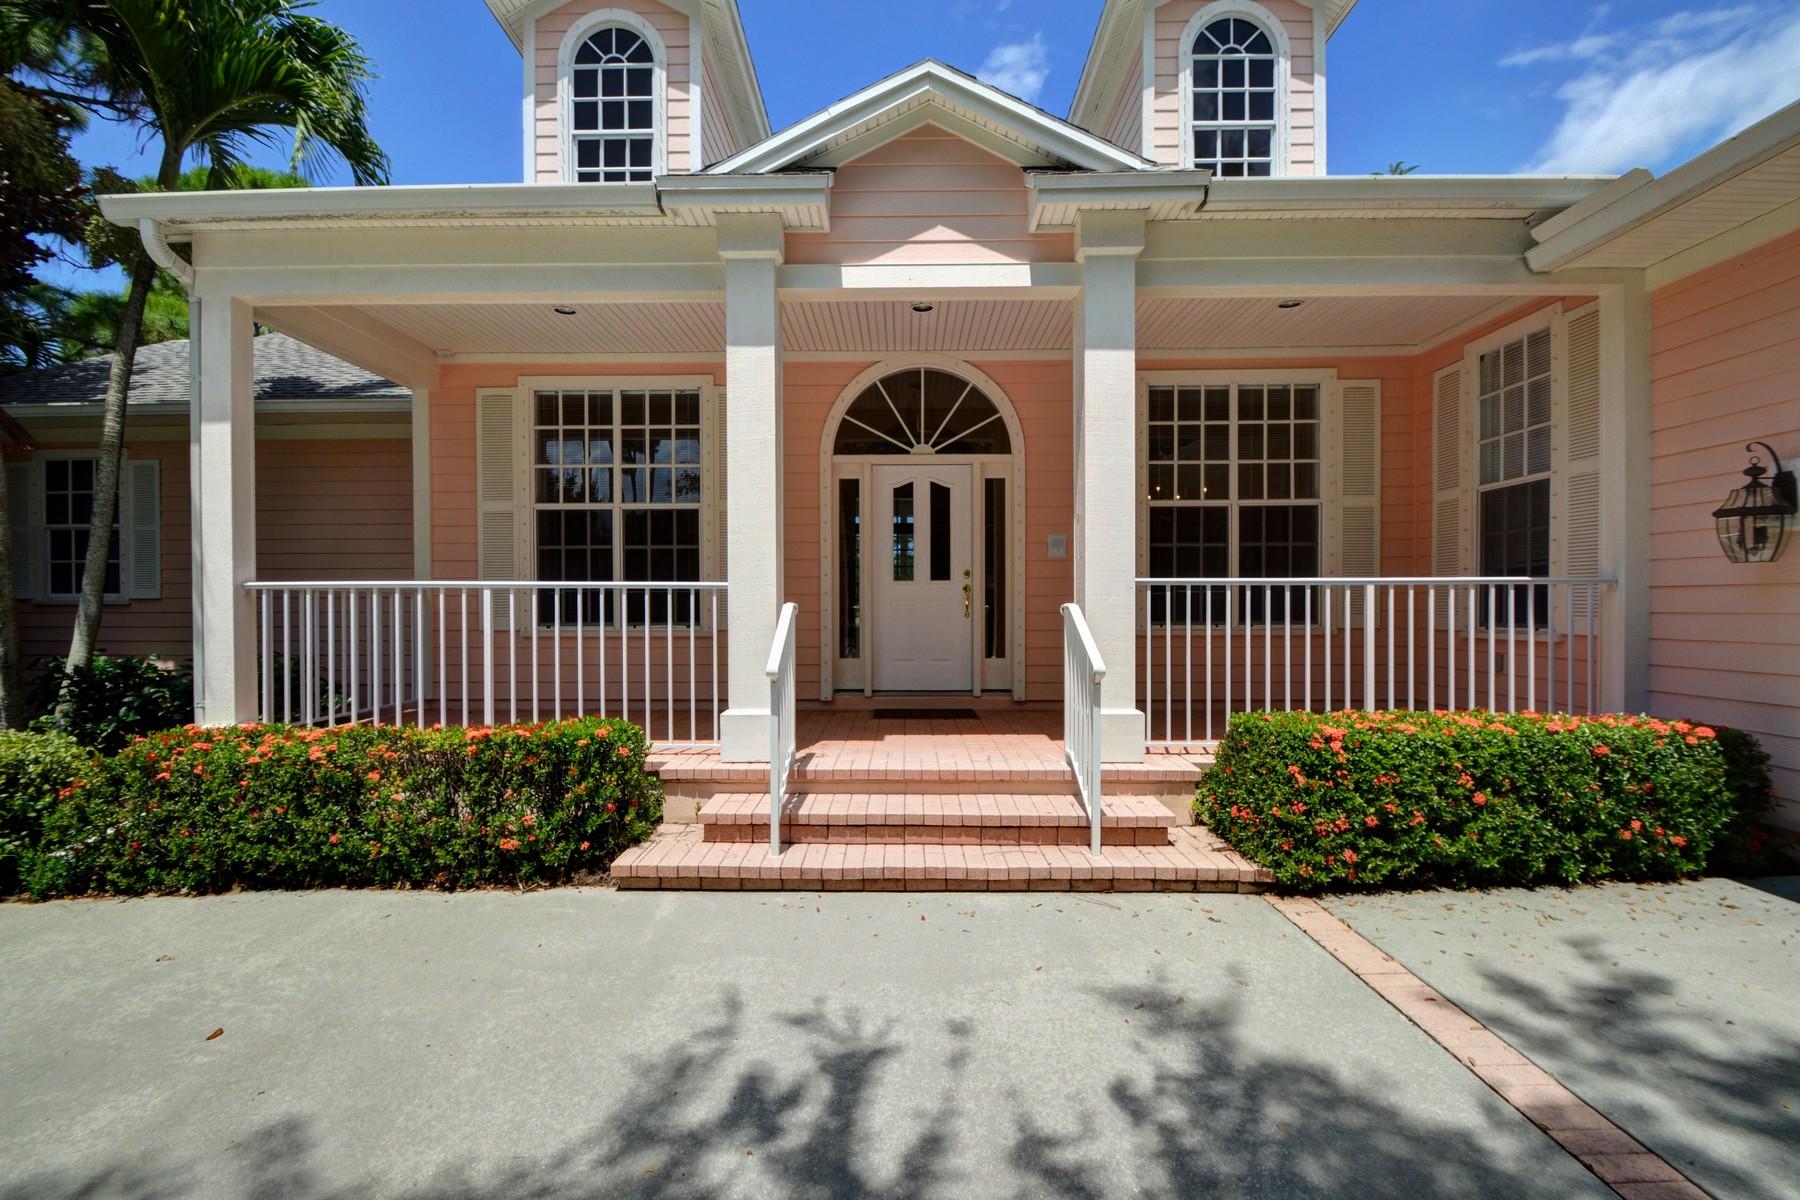 独户住宅 为 销售 在 Spectacular home on golf course with lake views 960 Wood Haven Lane SW Vero Beach, 佛罗里达州 32962 美国